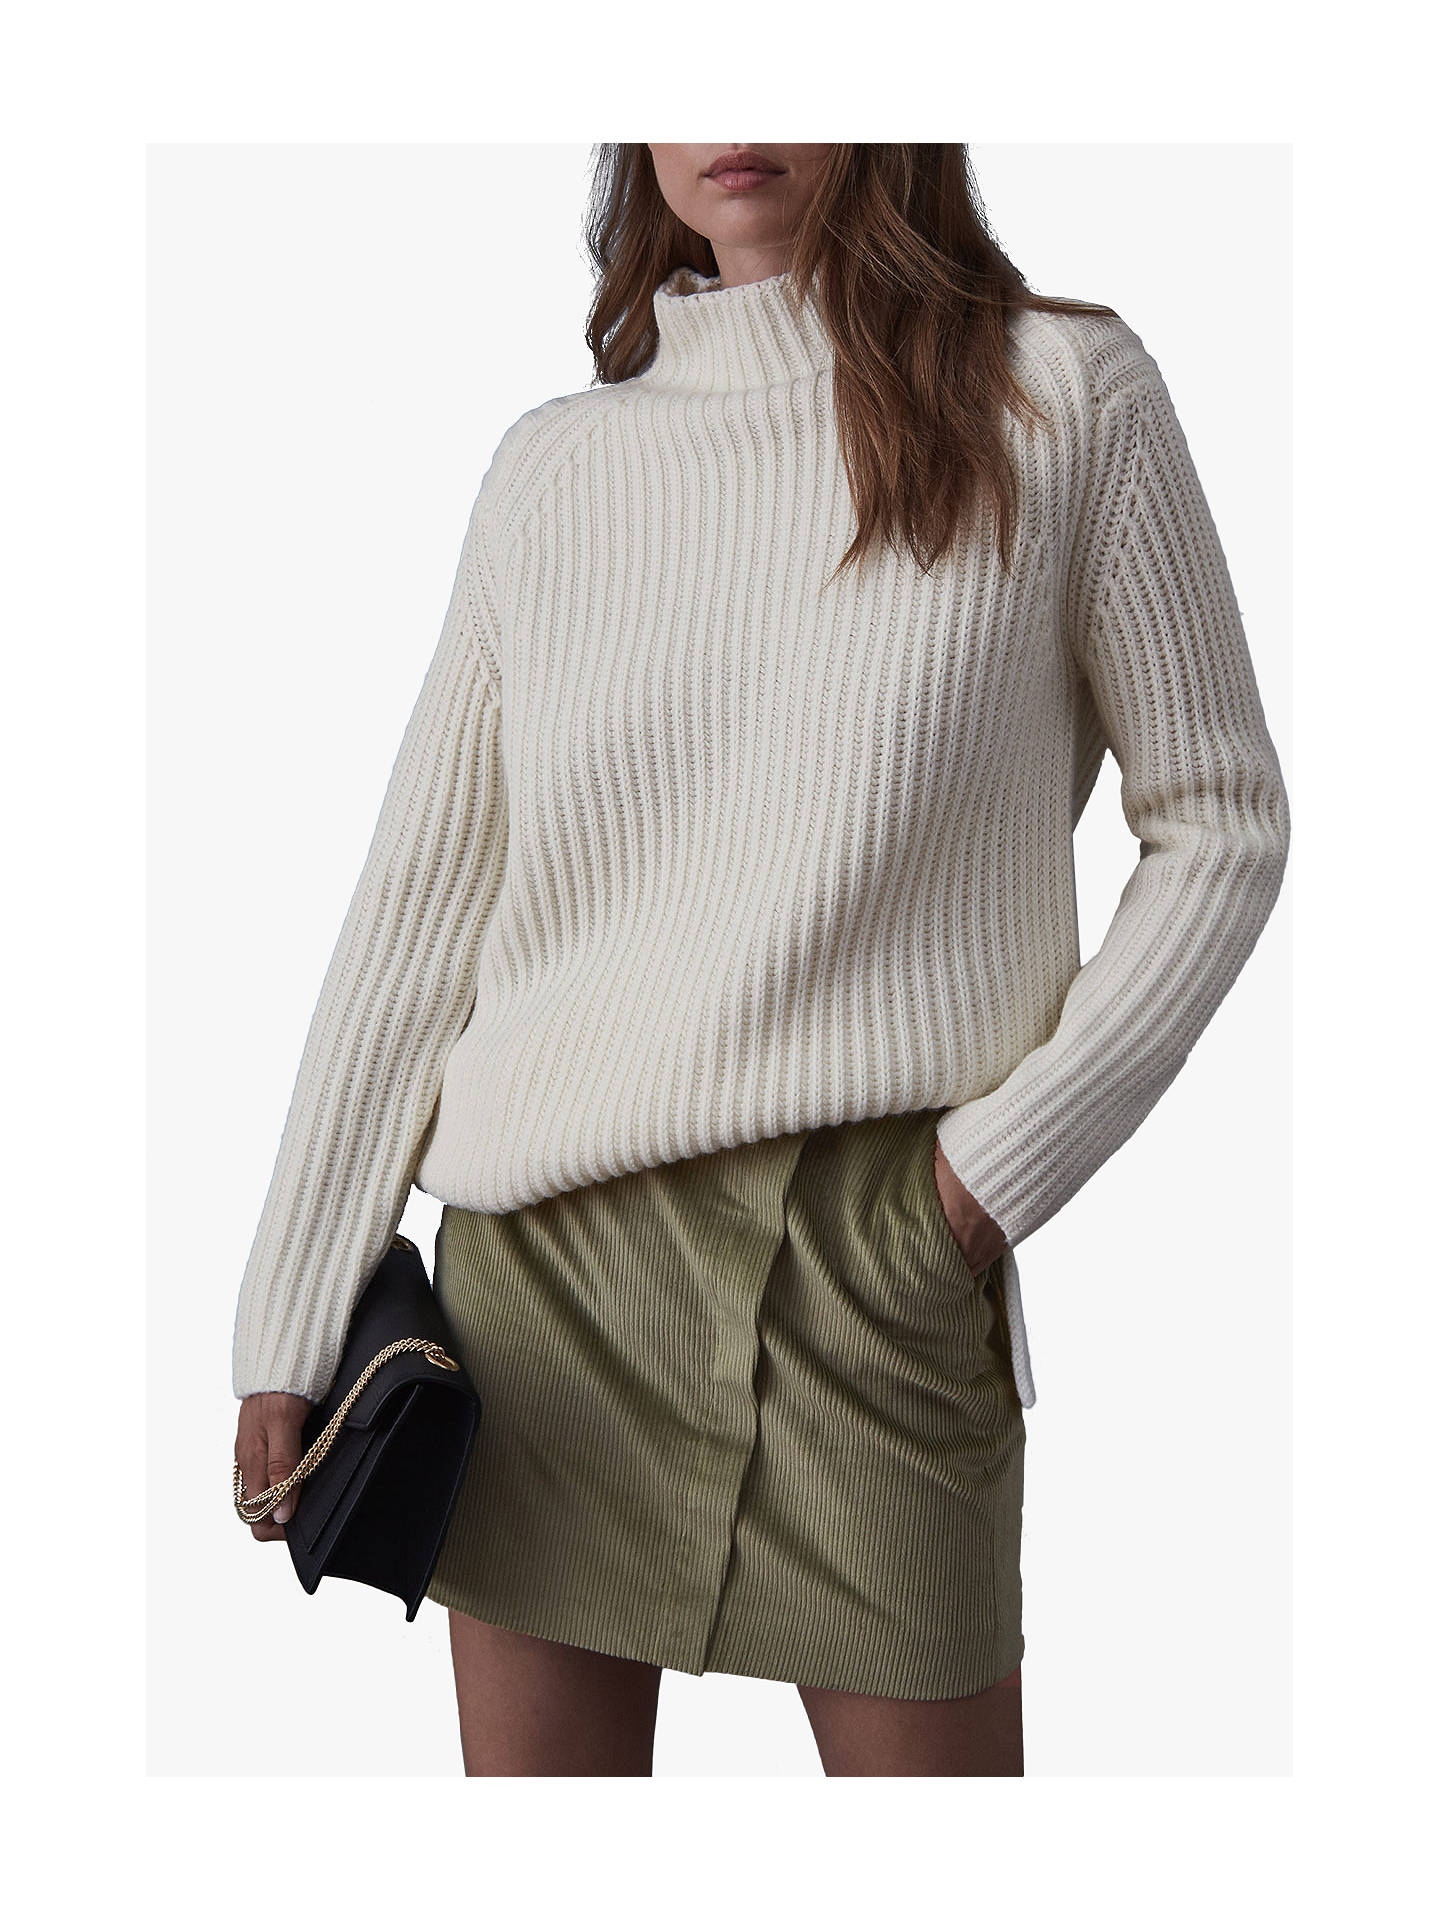 1c88905197 ... Buy Reiss Francis Corduroy Mini Skirt, Green Mid, 8 Online at  johnlewis.com